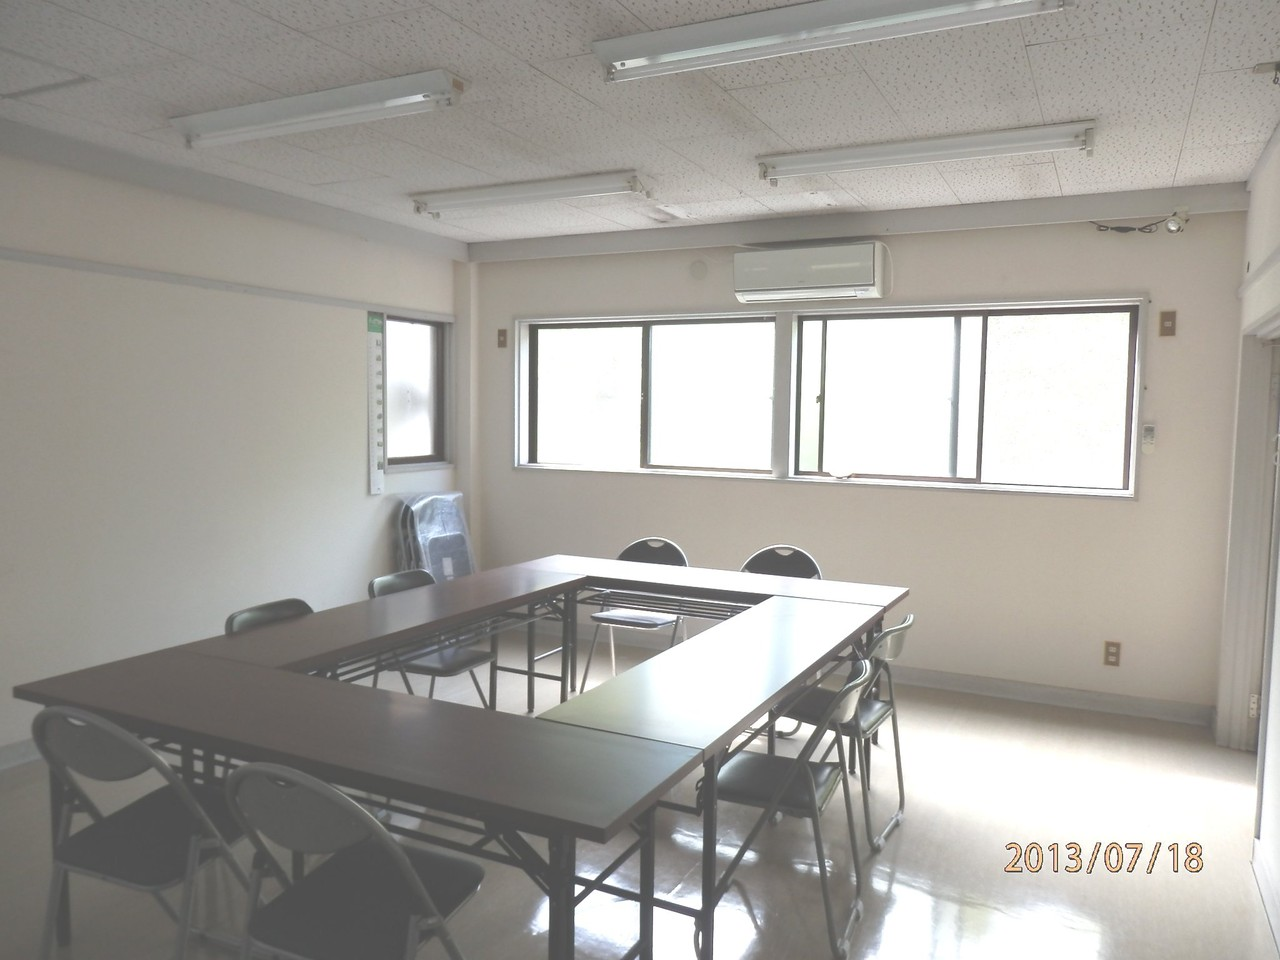 KECビル2階、201号室(10坪)内部(無料英語道場として使用)